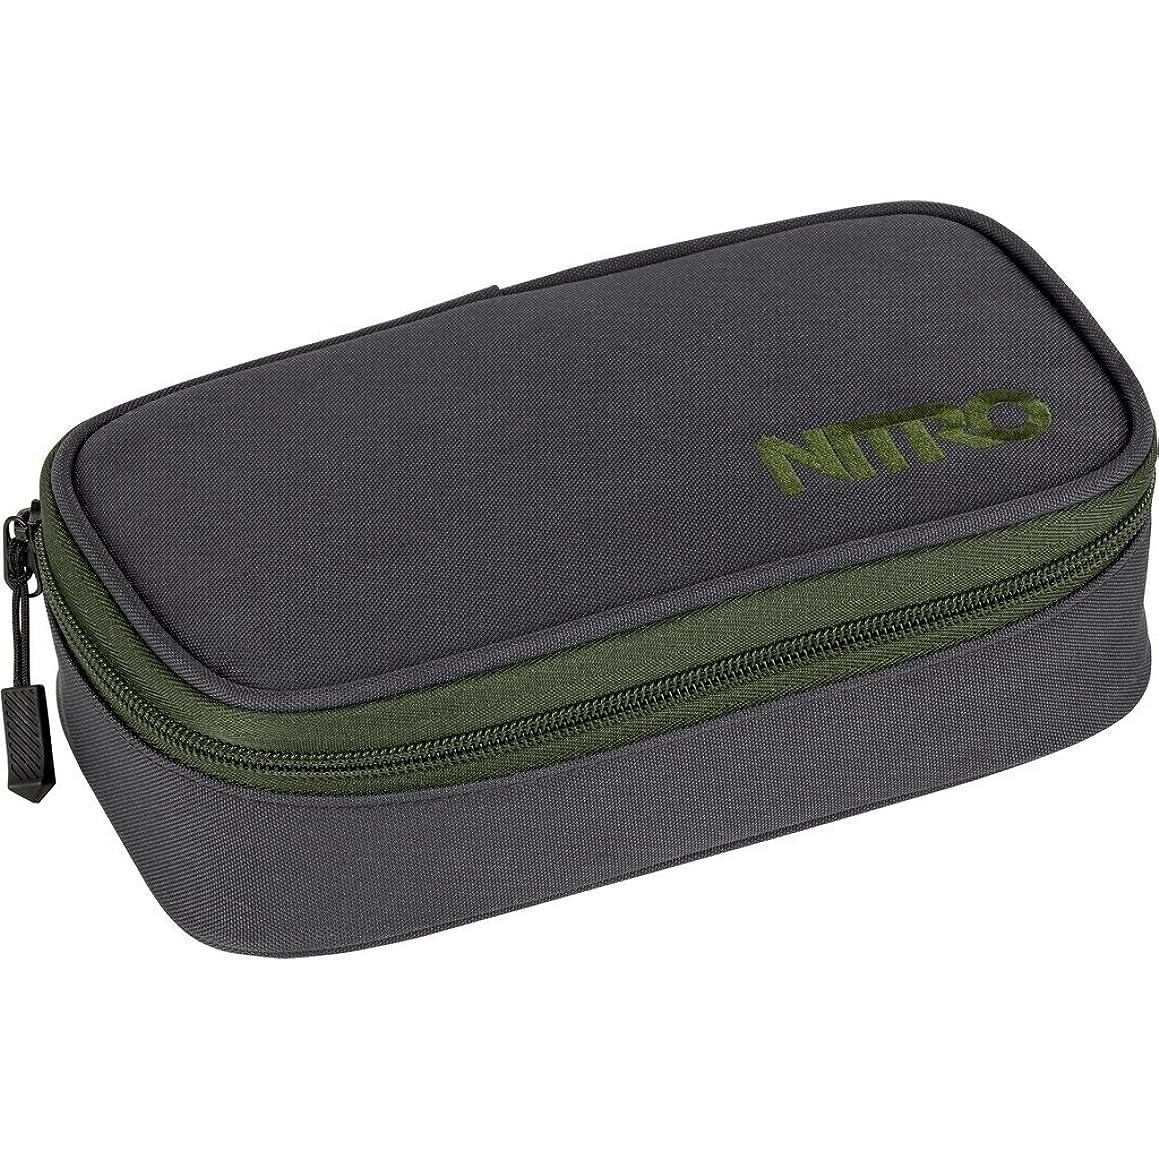 Nitro Snowboards Pencil Case XL Backpack, Unisex, Pencil CASE XL